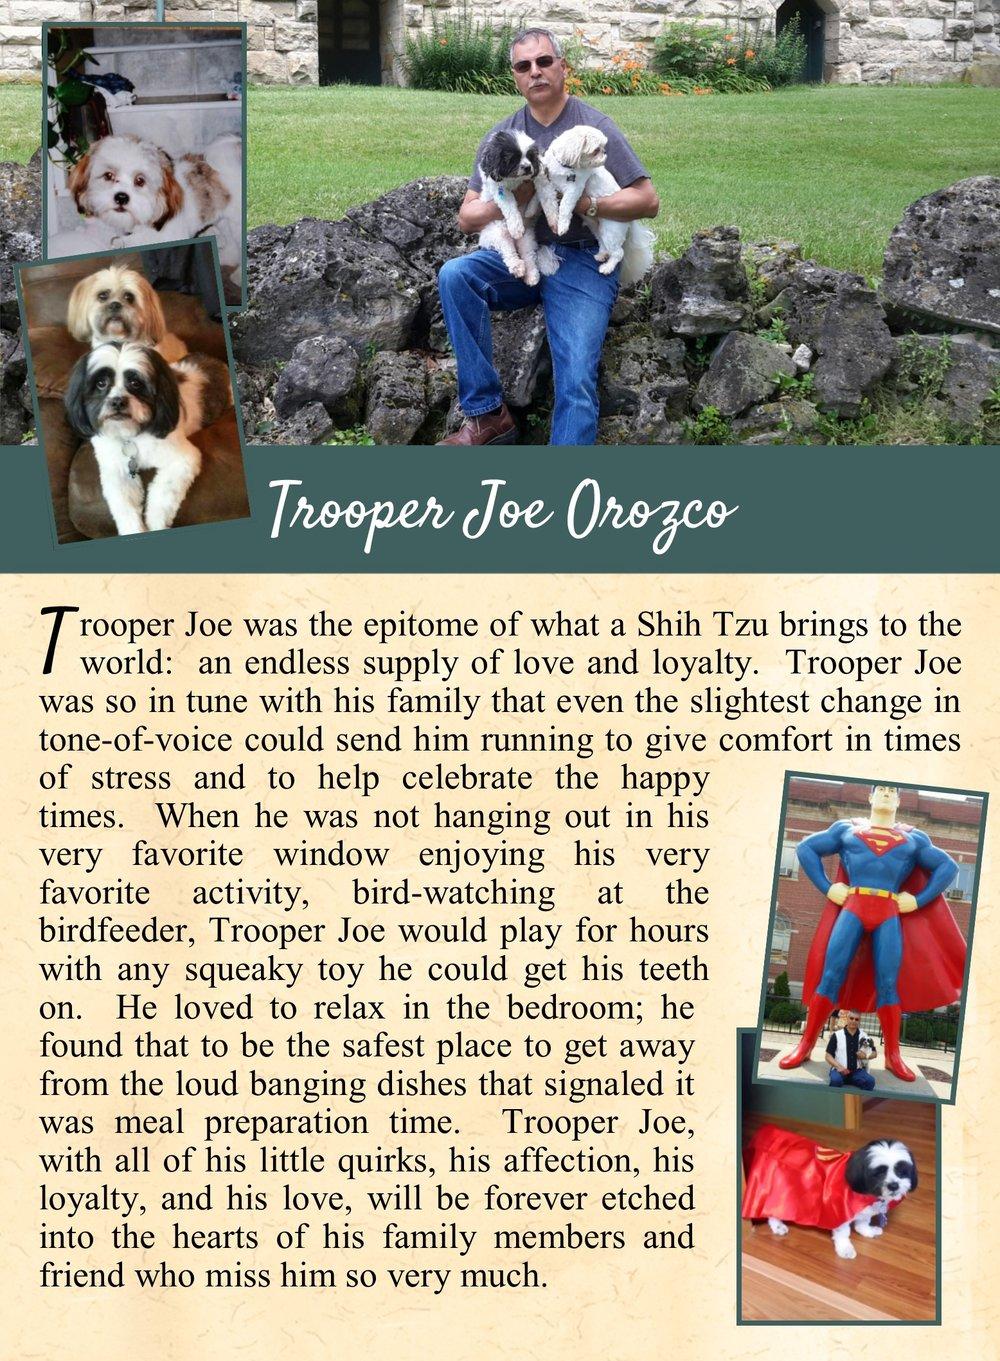 Trooper Joe's Life Tail